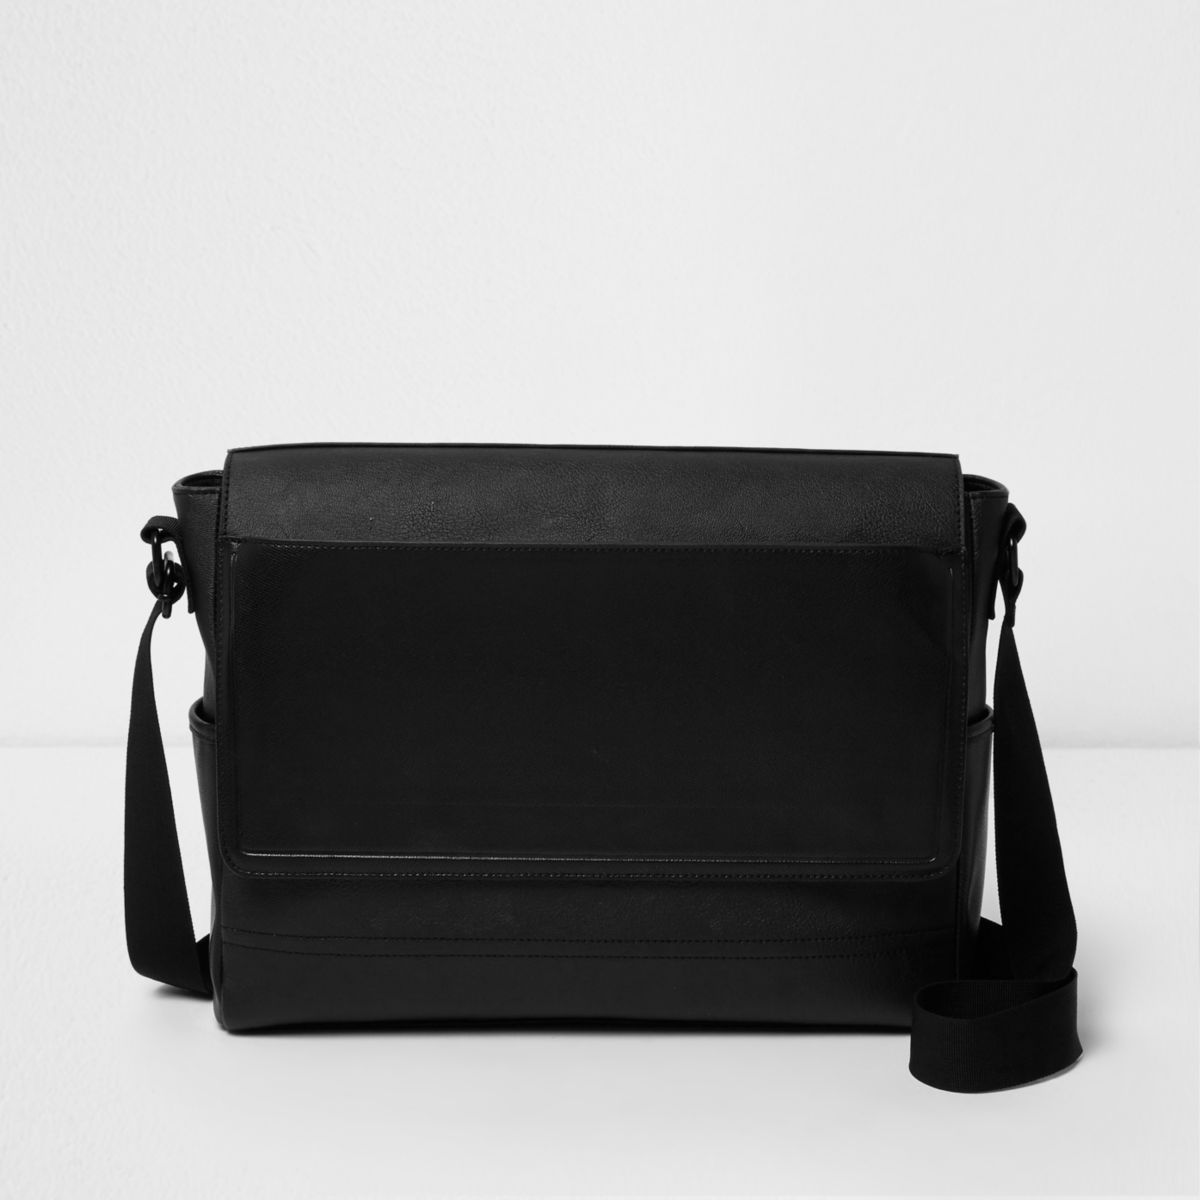 Black Flapover Satchel Bag